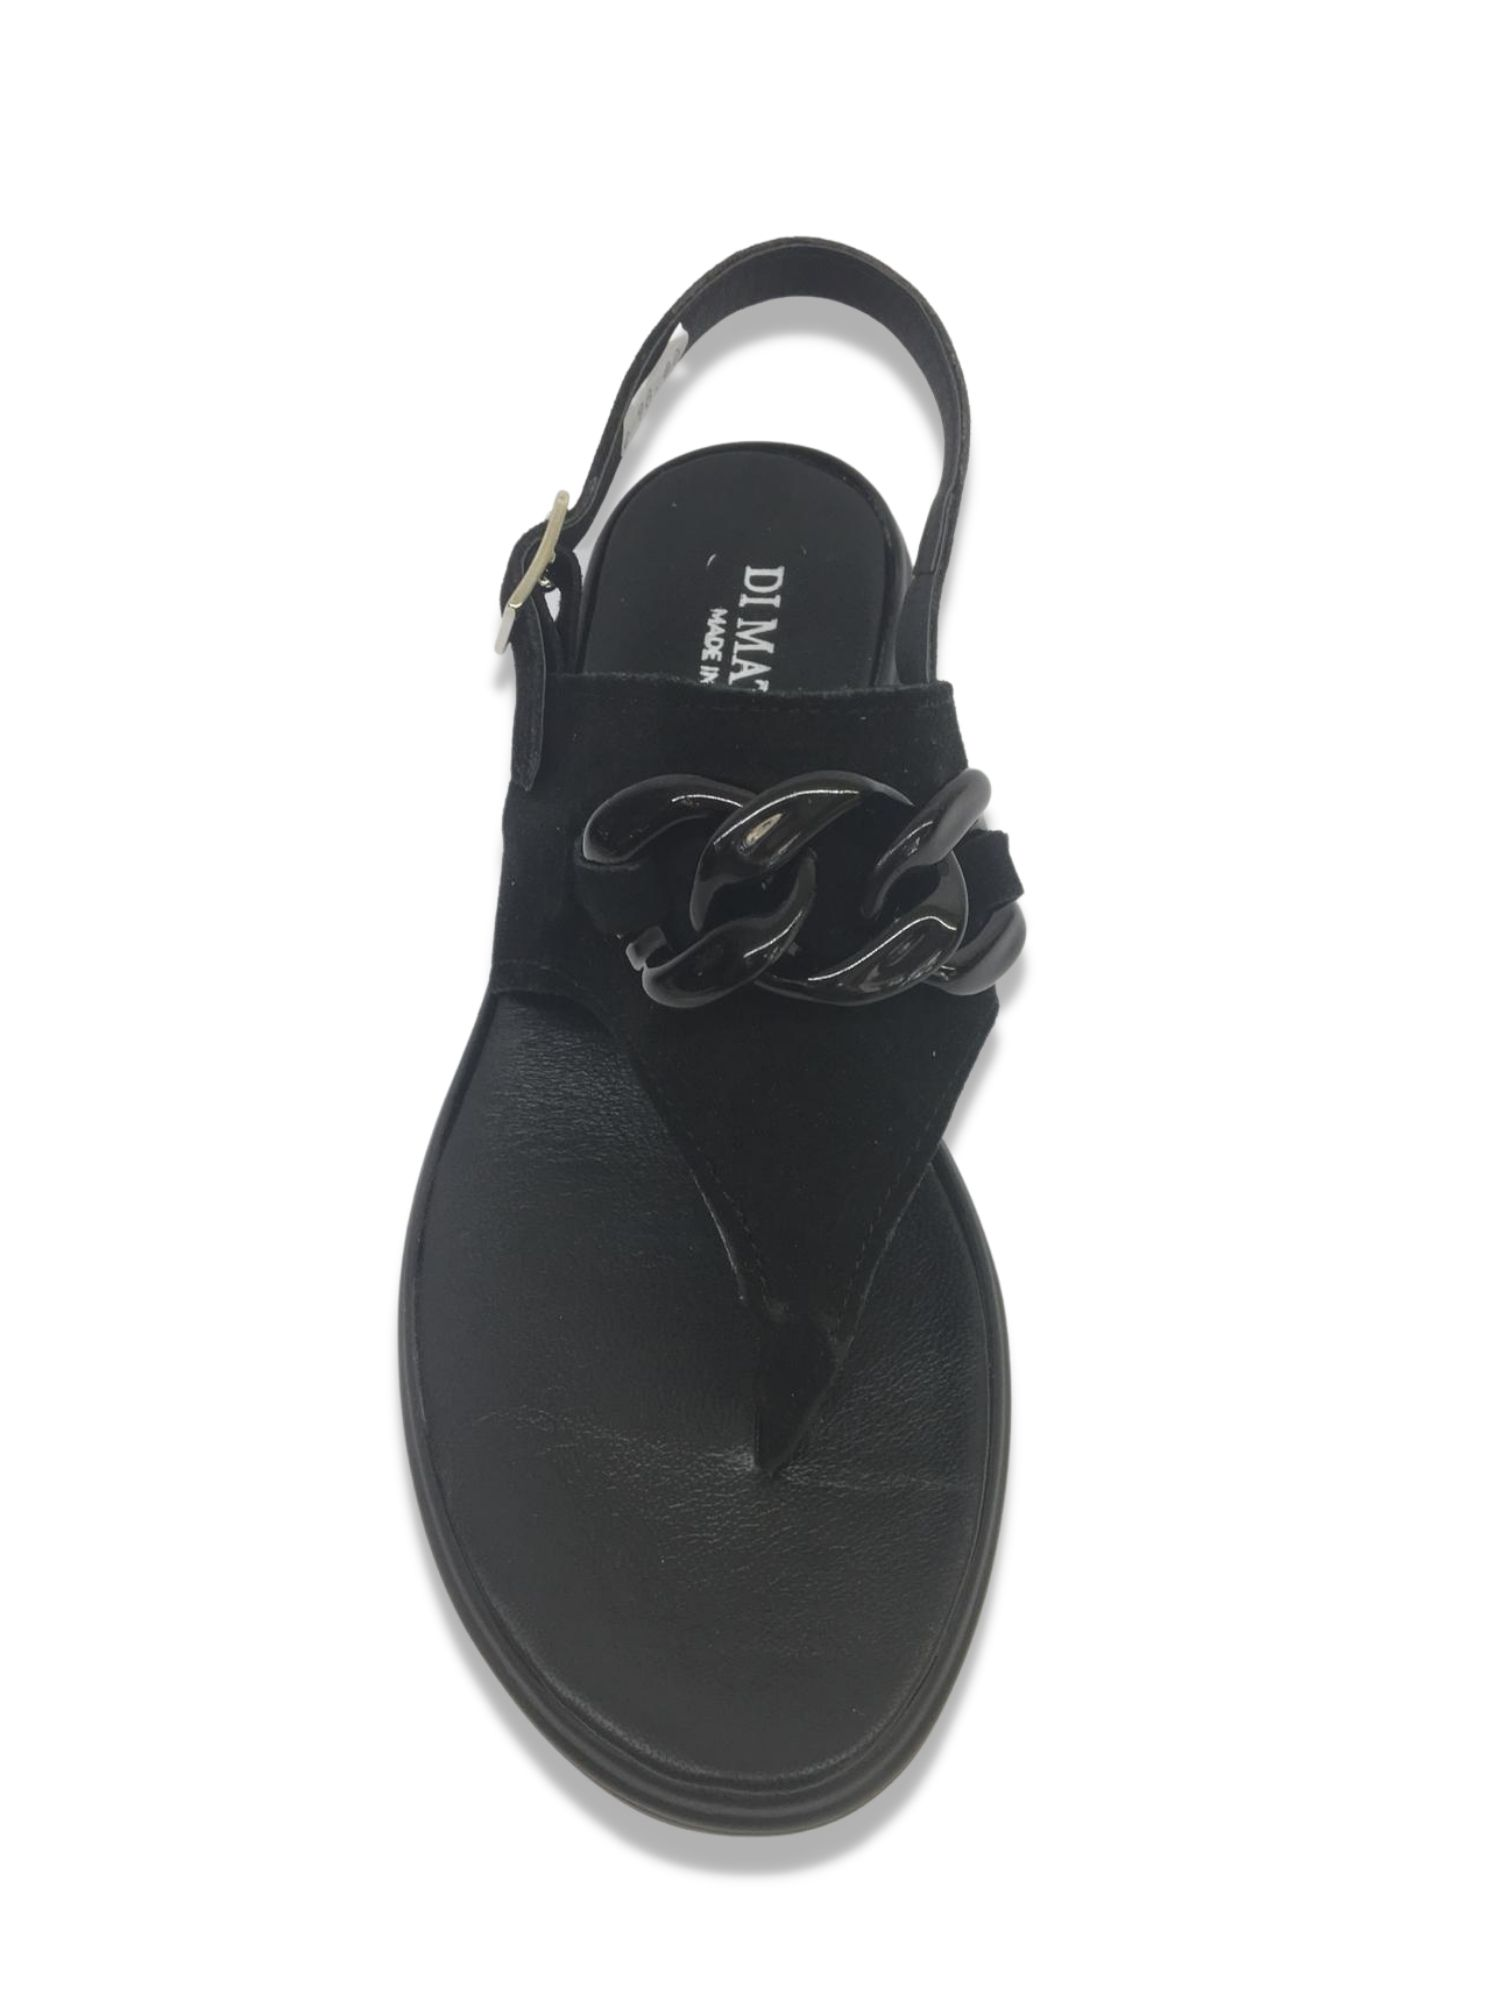 Sandalo Infradito Made in Italy 303 Nero alto